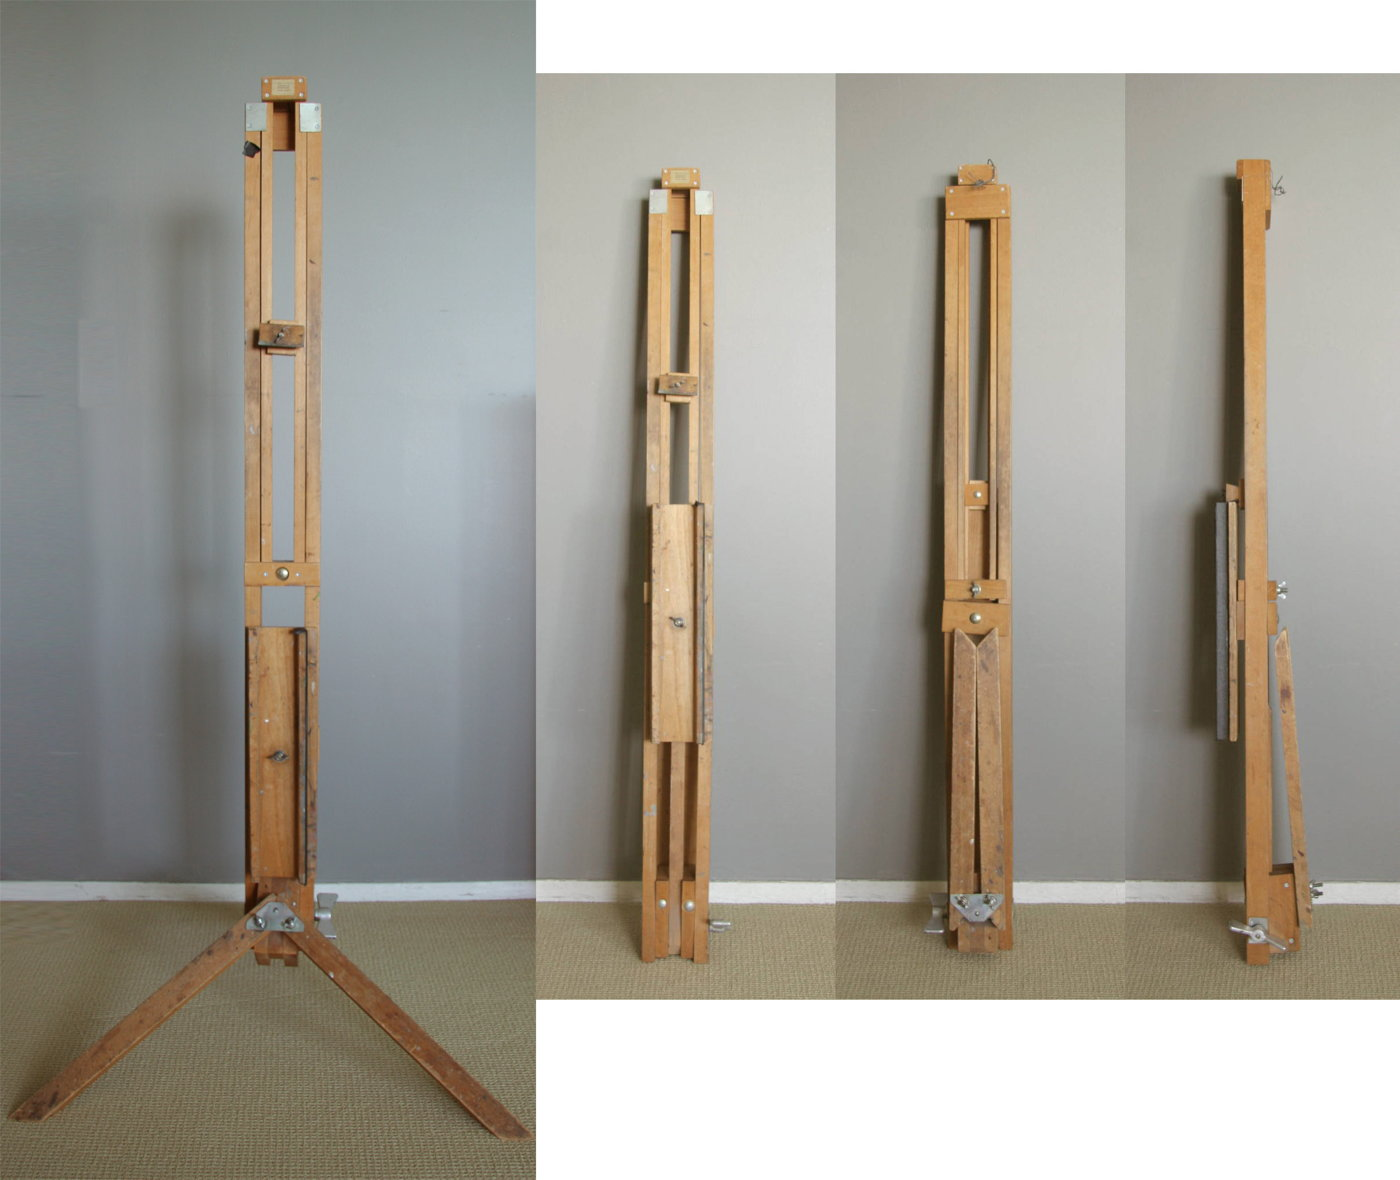 Winsor /& Newton Thames Radial Easel